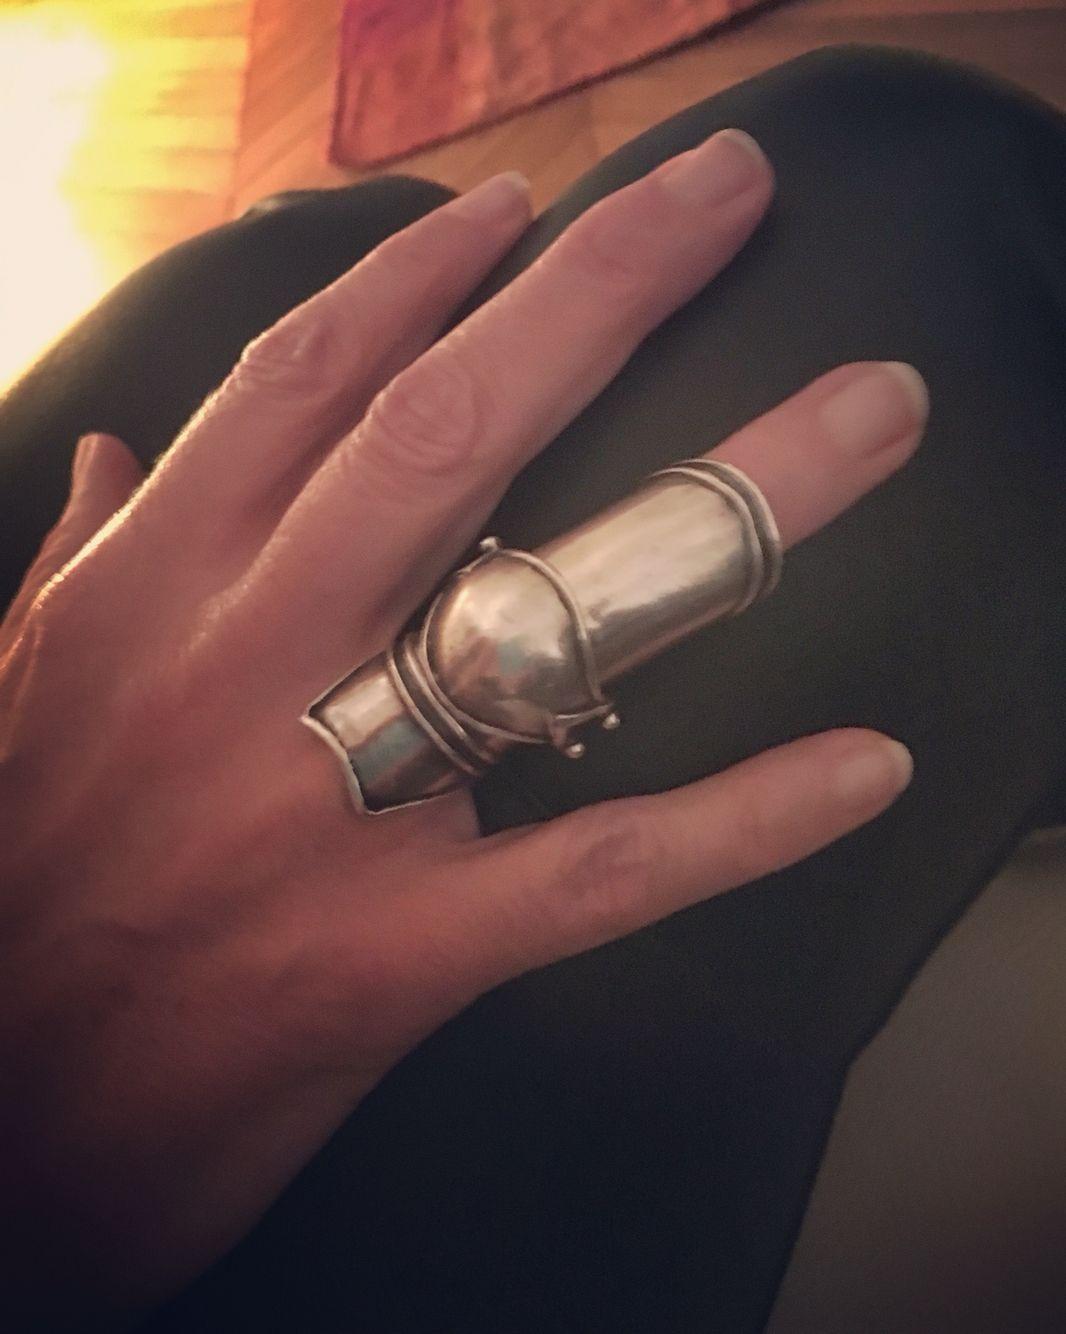 Interesting ring